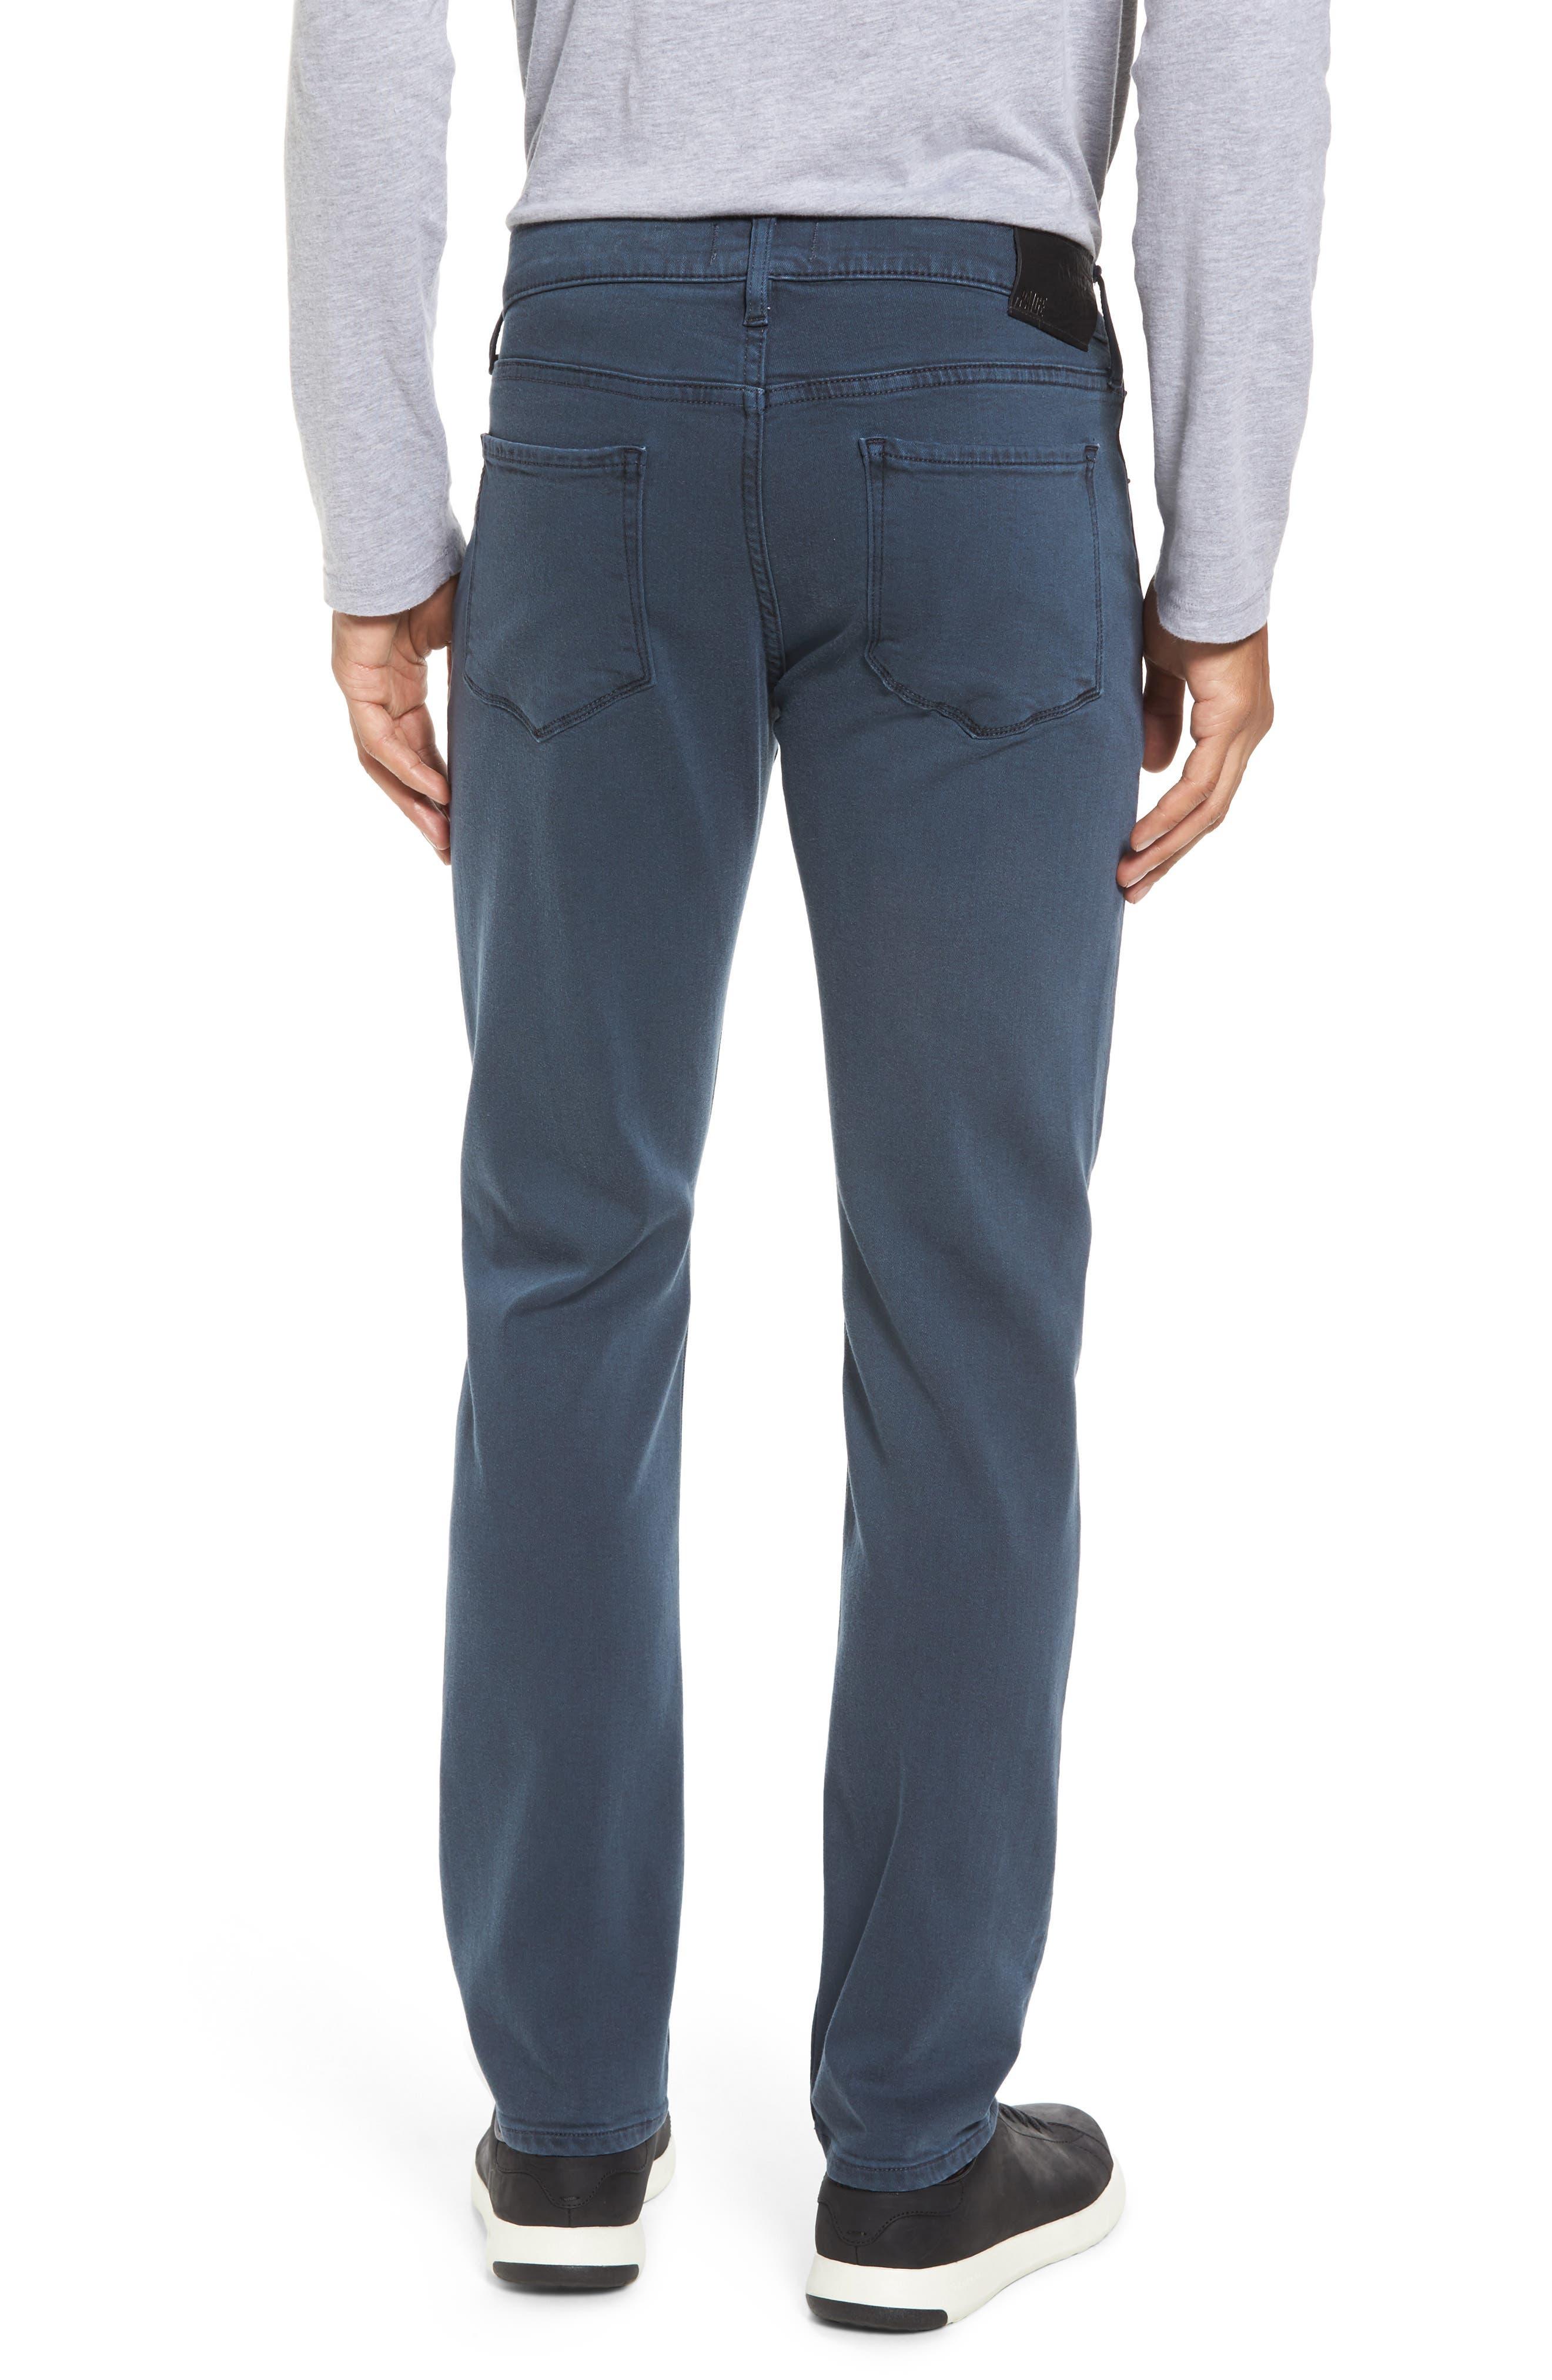 Lennox Slim Fit Jeans,                             Alternate thumbnail 2, color,                             Vintage Amalfi